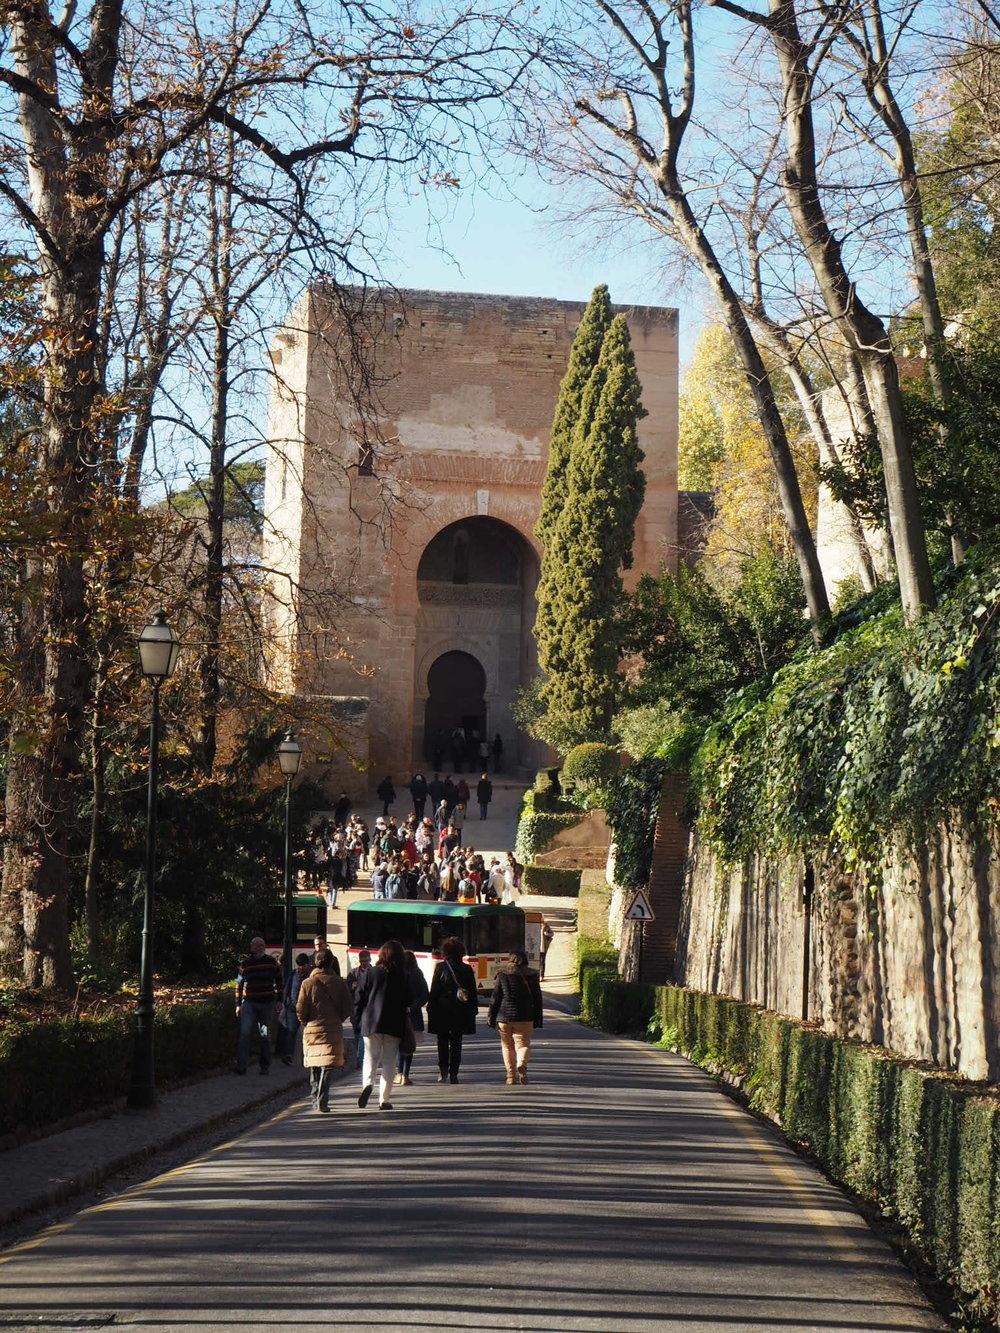 Puerta de la justicia is the original entrance gate to the Alhambra, a grand display of Moorish architecture.